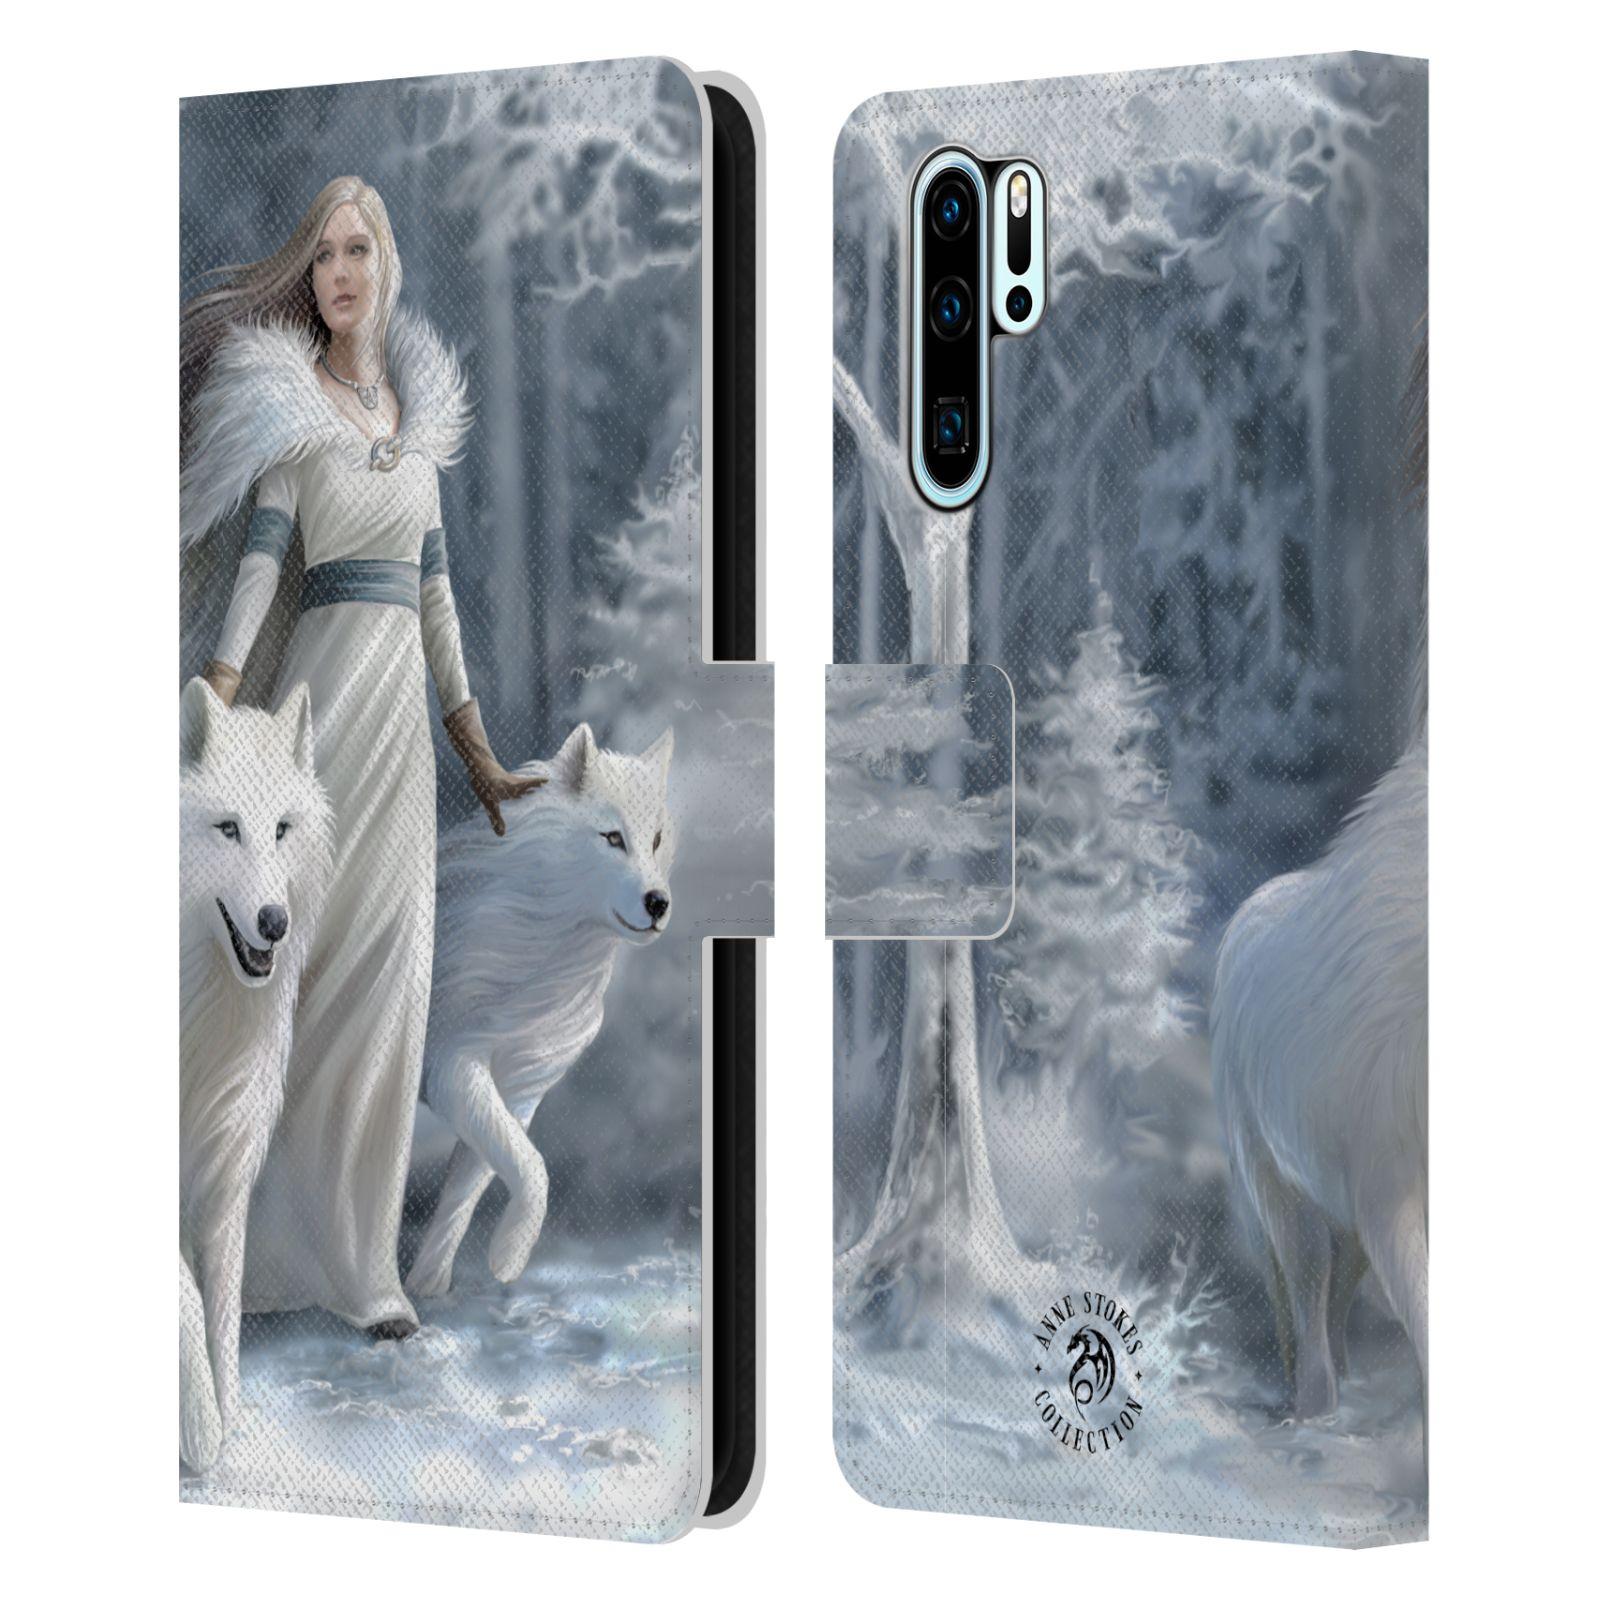 Pouzdro na mobil Huawei P30 PRO - Head Case - fantasy - vlk zimní stráž